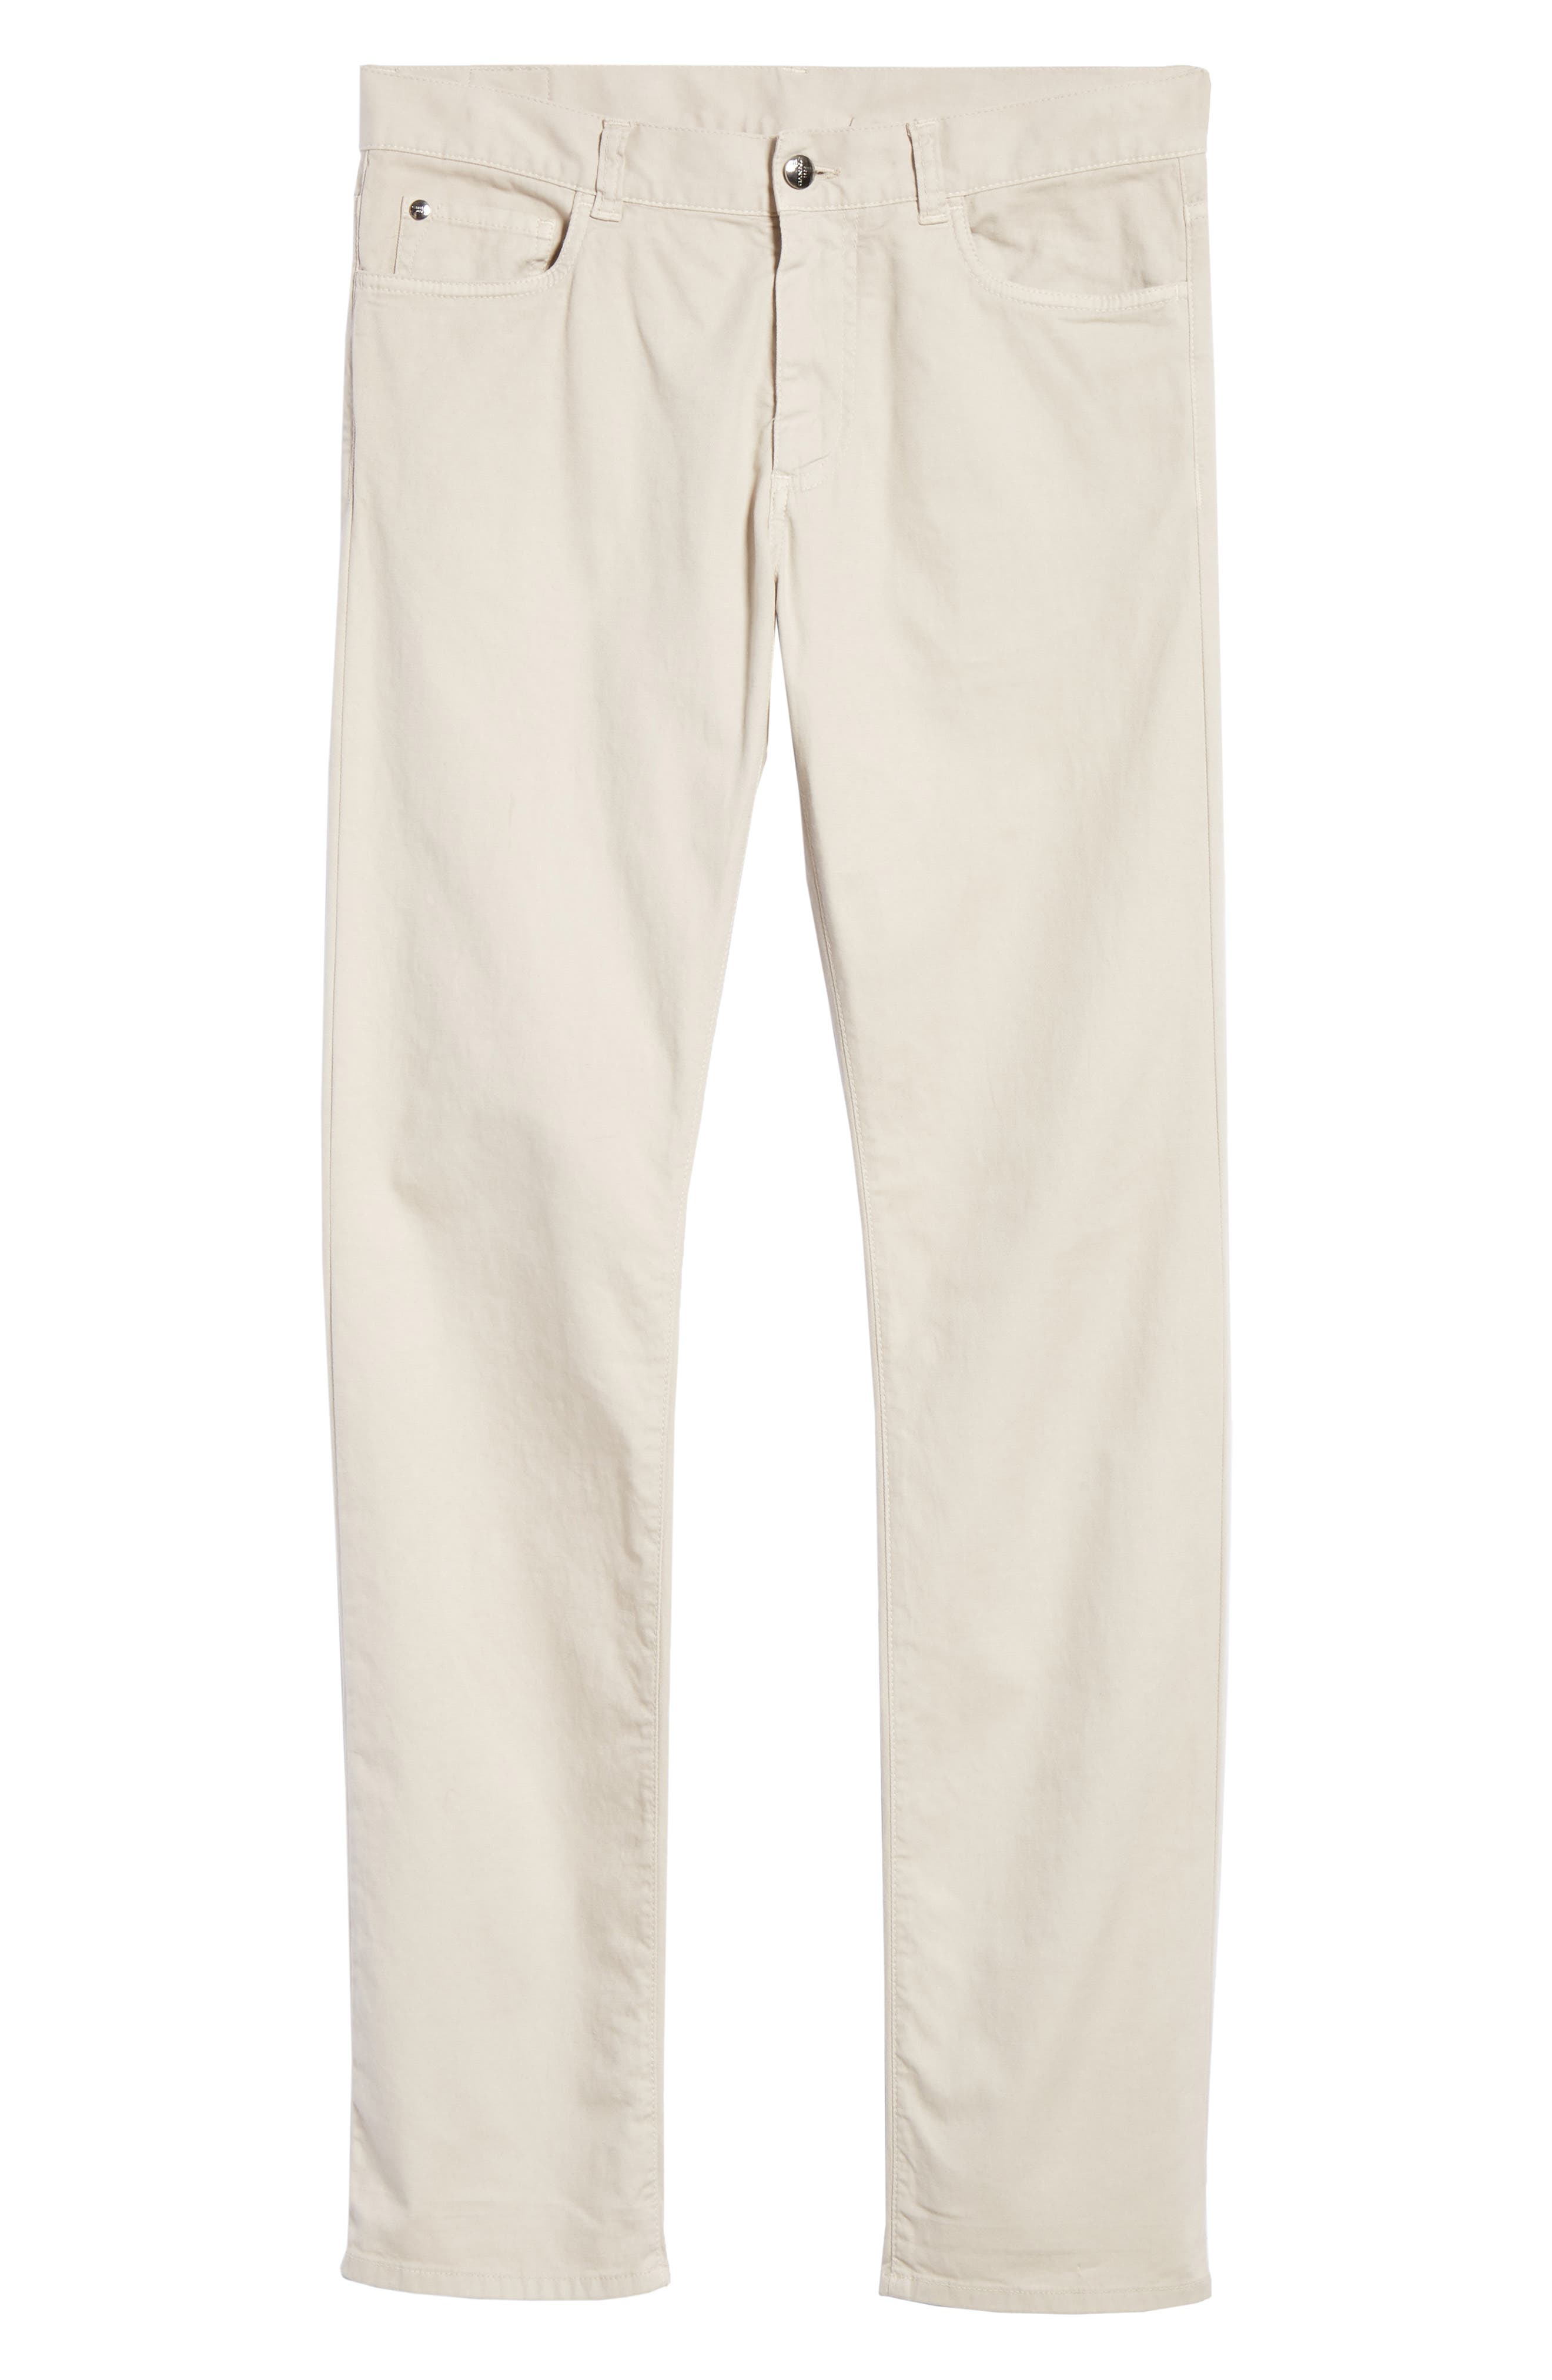 CANALI, Stretch Cotton Five Pocket Trousers, Alternate thumbnail 7, color, BEIGE